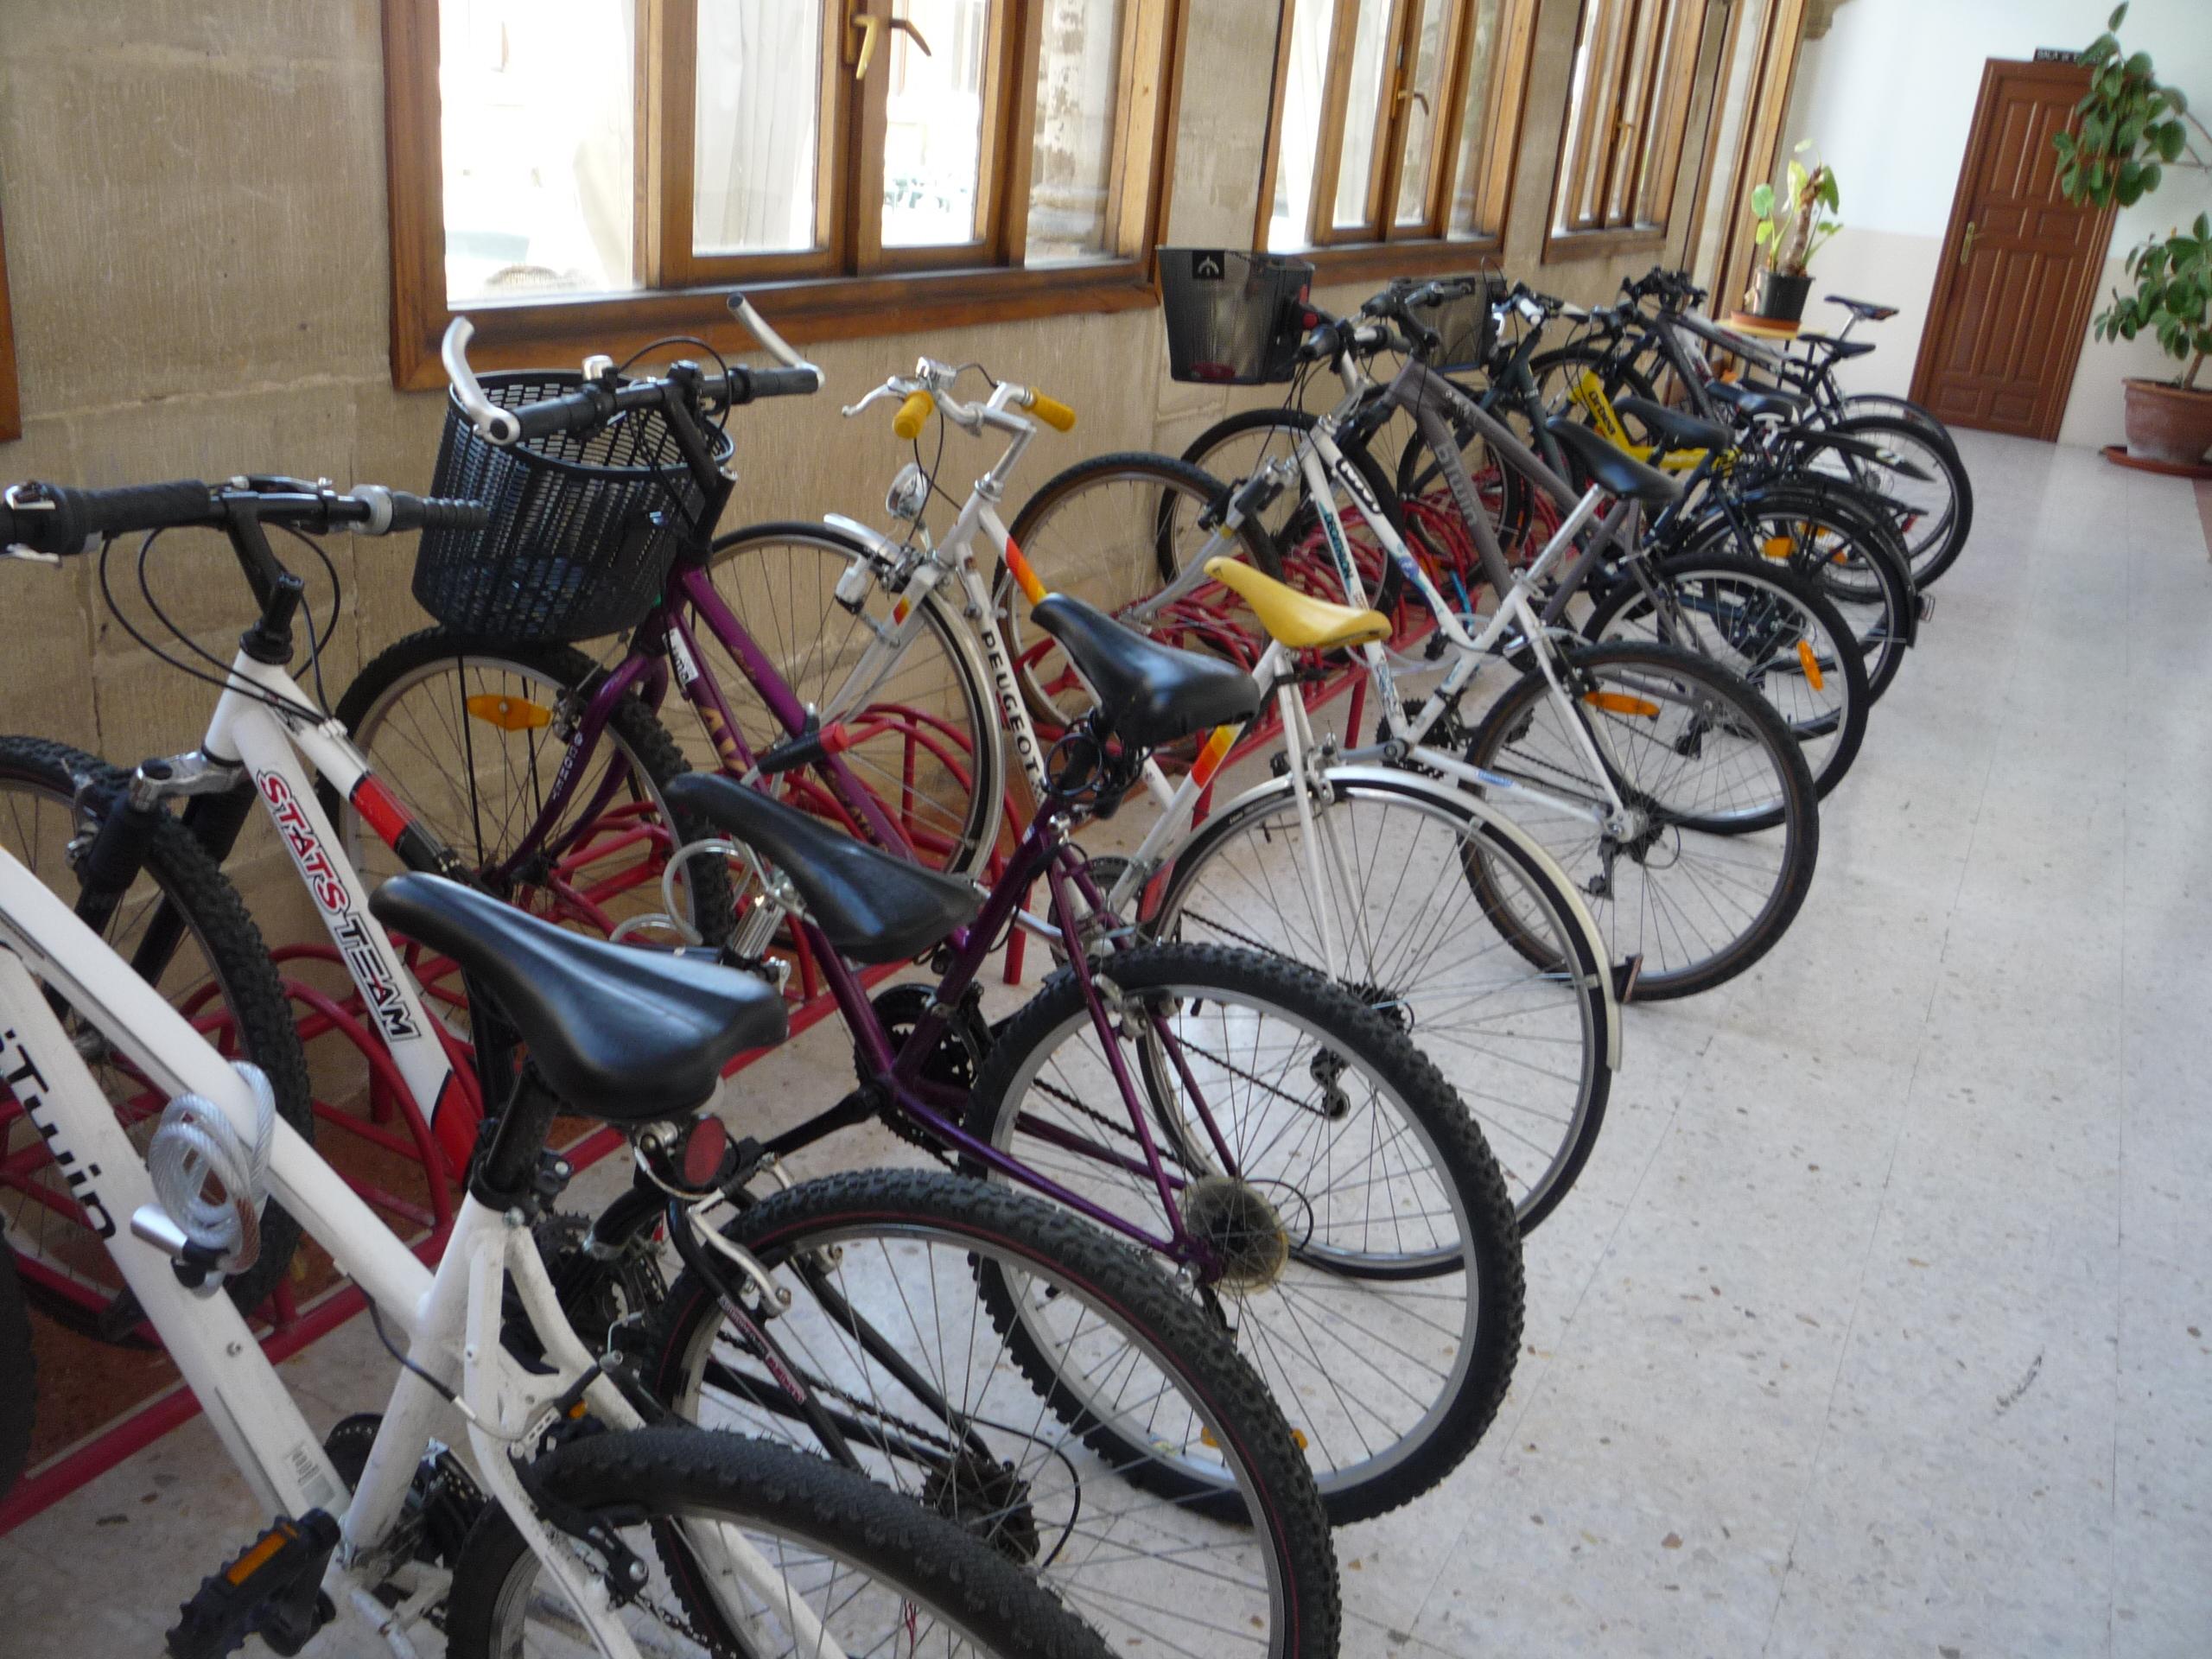 Residencia Universitaria SAN JOSE - Parking Bicis